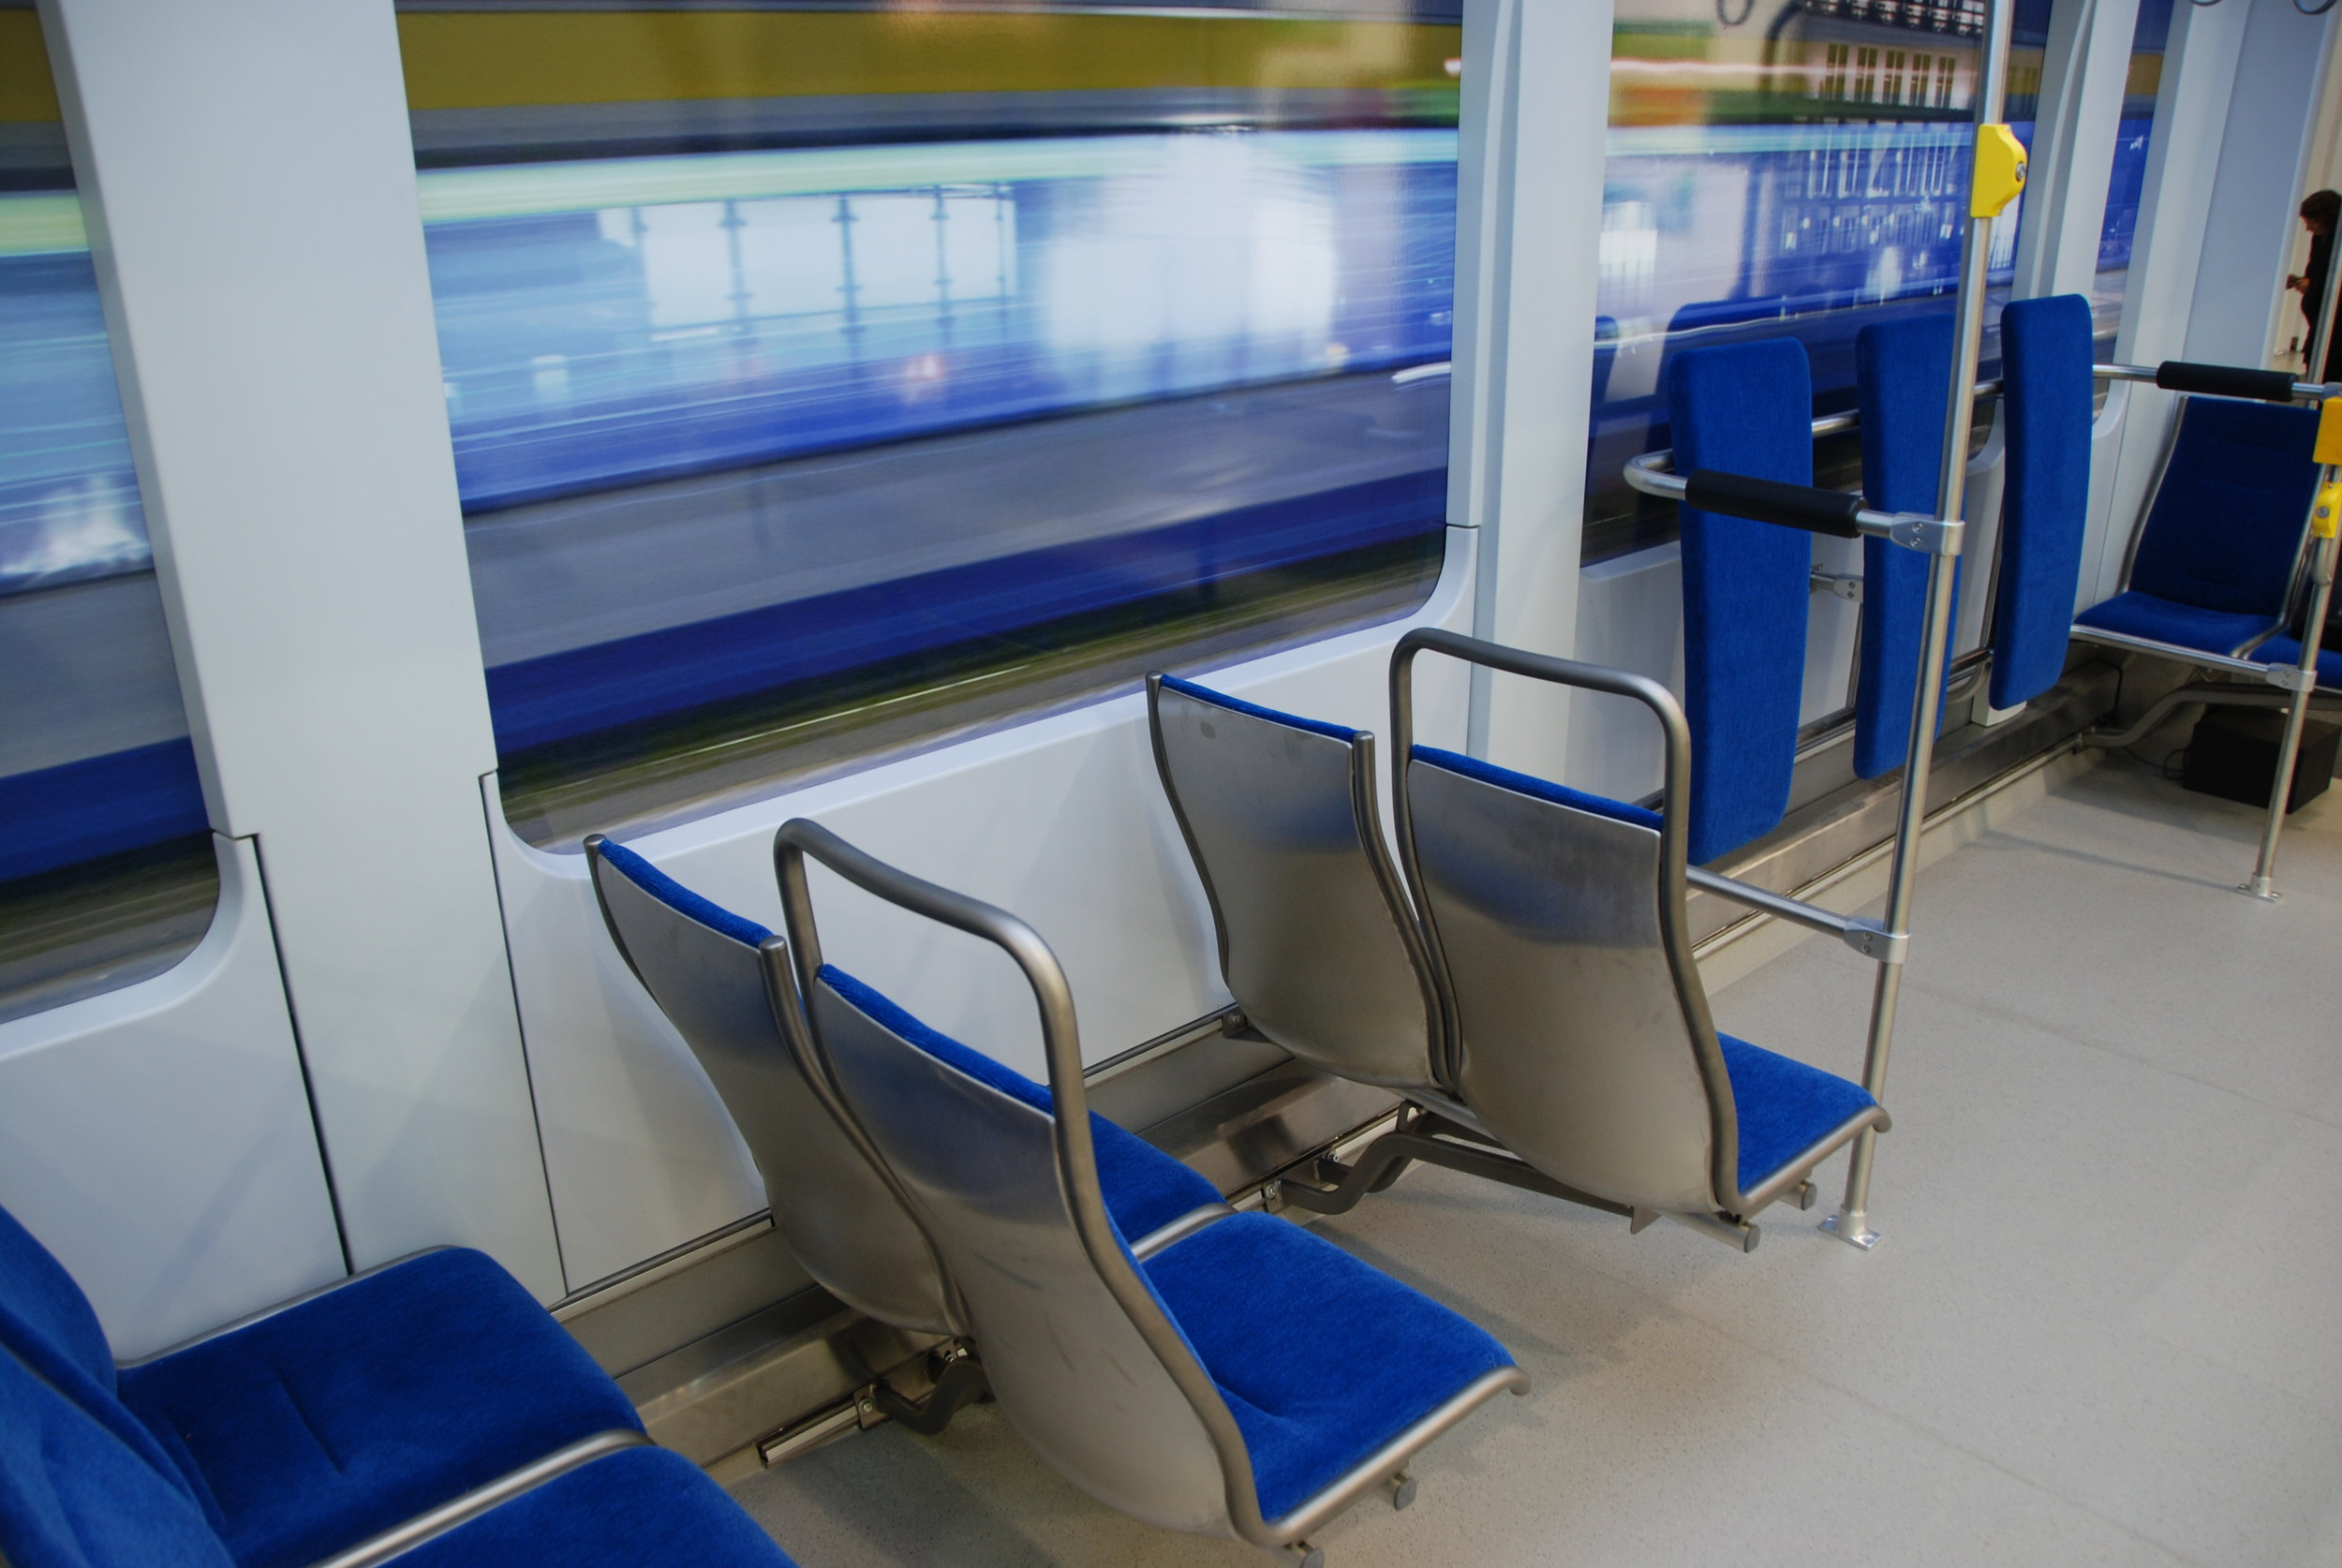 Pohled do makety interiéru vozu Tramino pro Lipsko na veletrhu InnoTrans. (foto: Libor Hinčica)